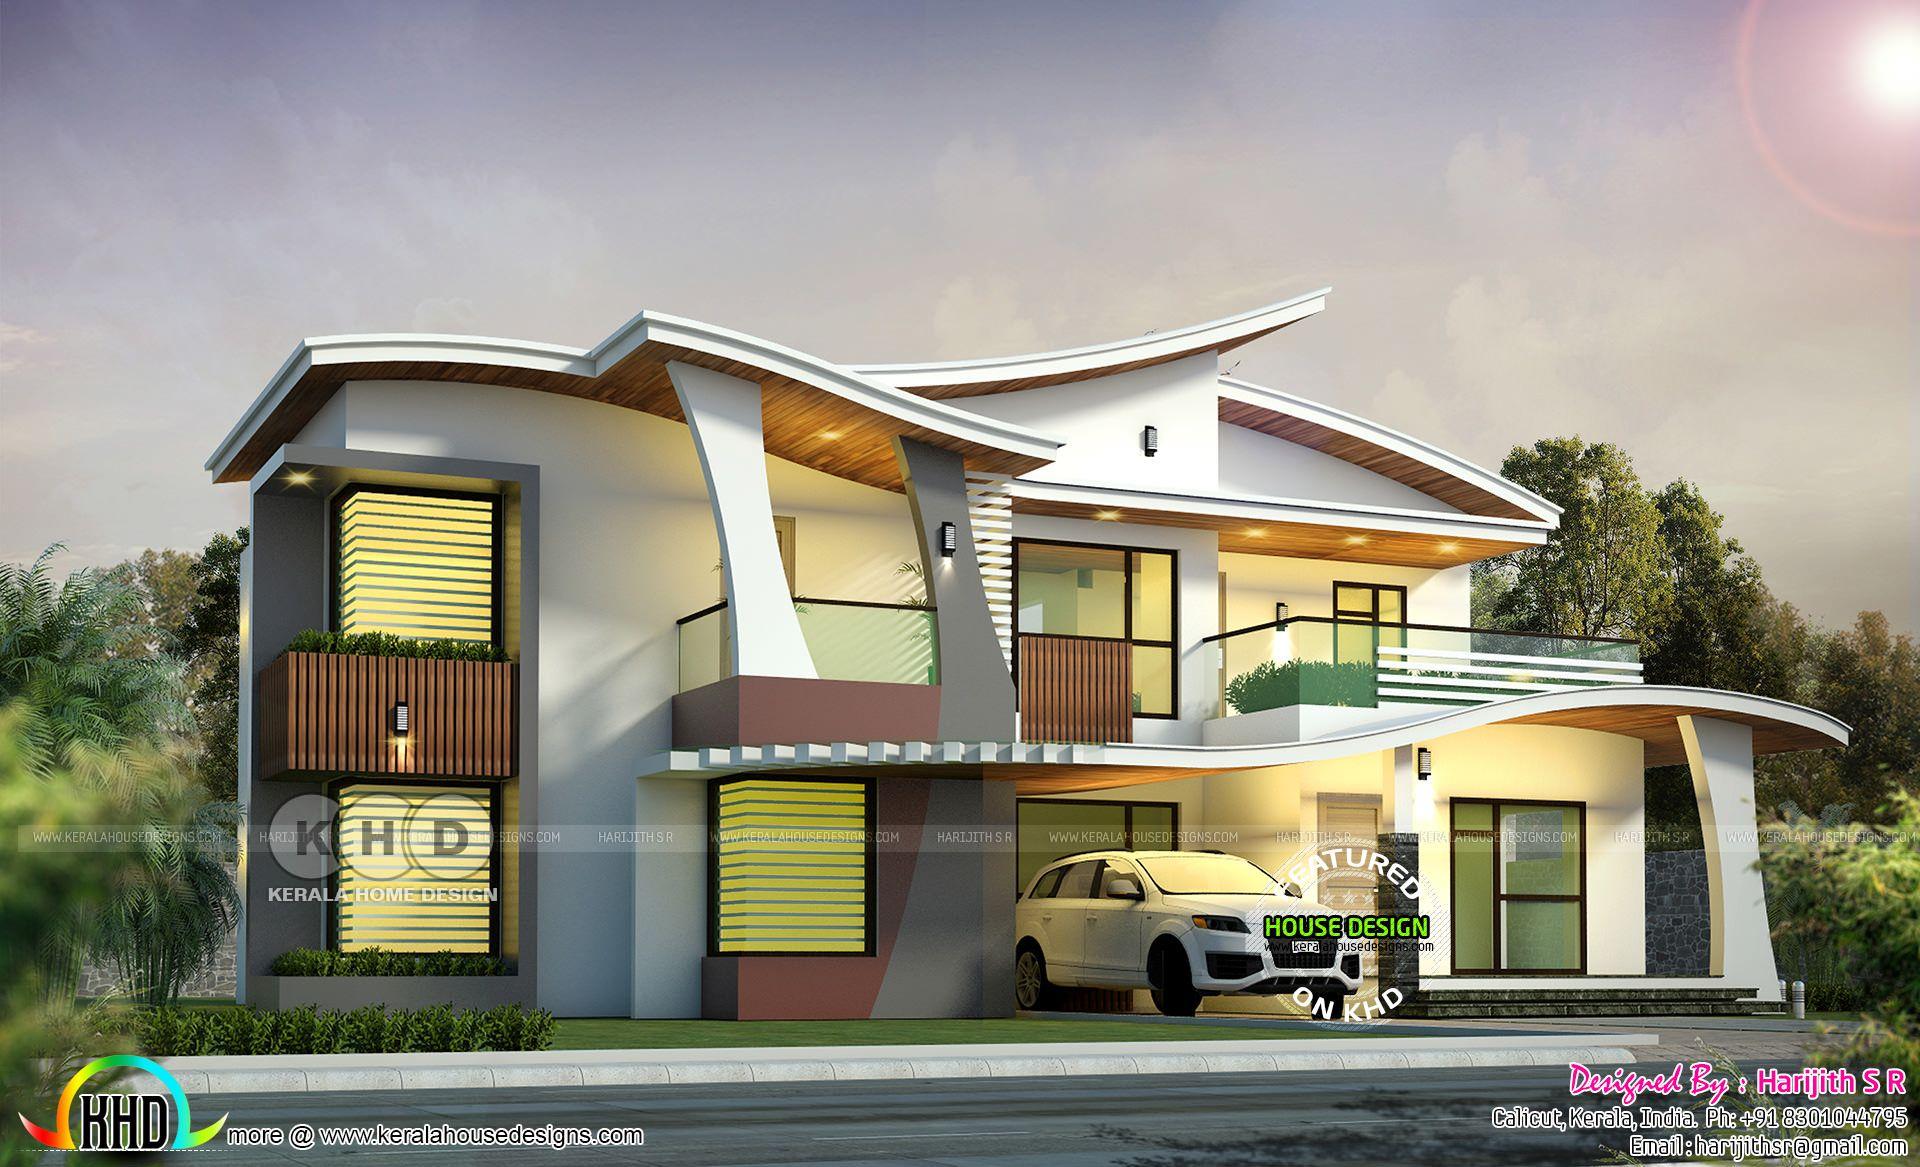 2943 Sq Ft Ultra Modern Kerala Home Design Modern Residential Architecture Kerala House Design Residential Architecture